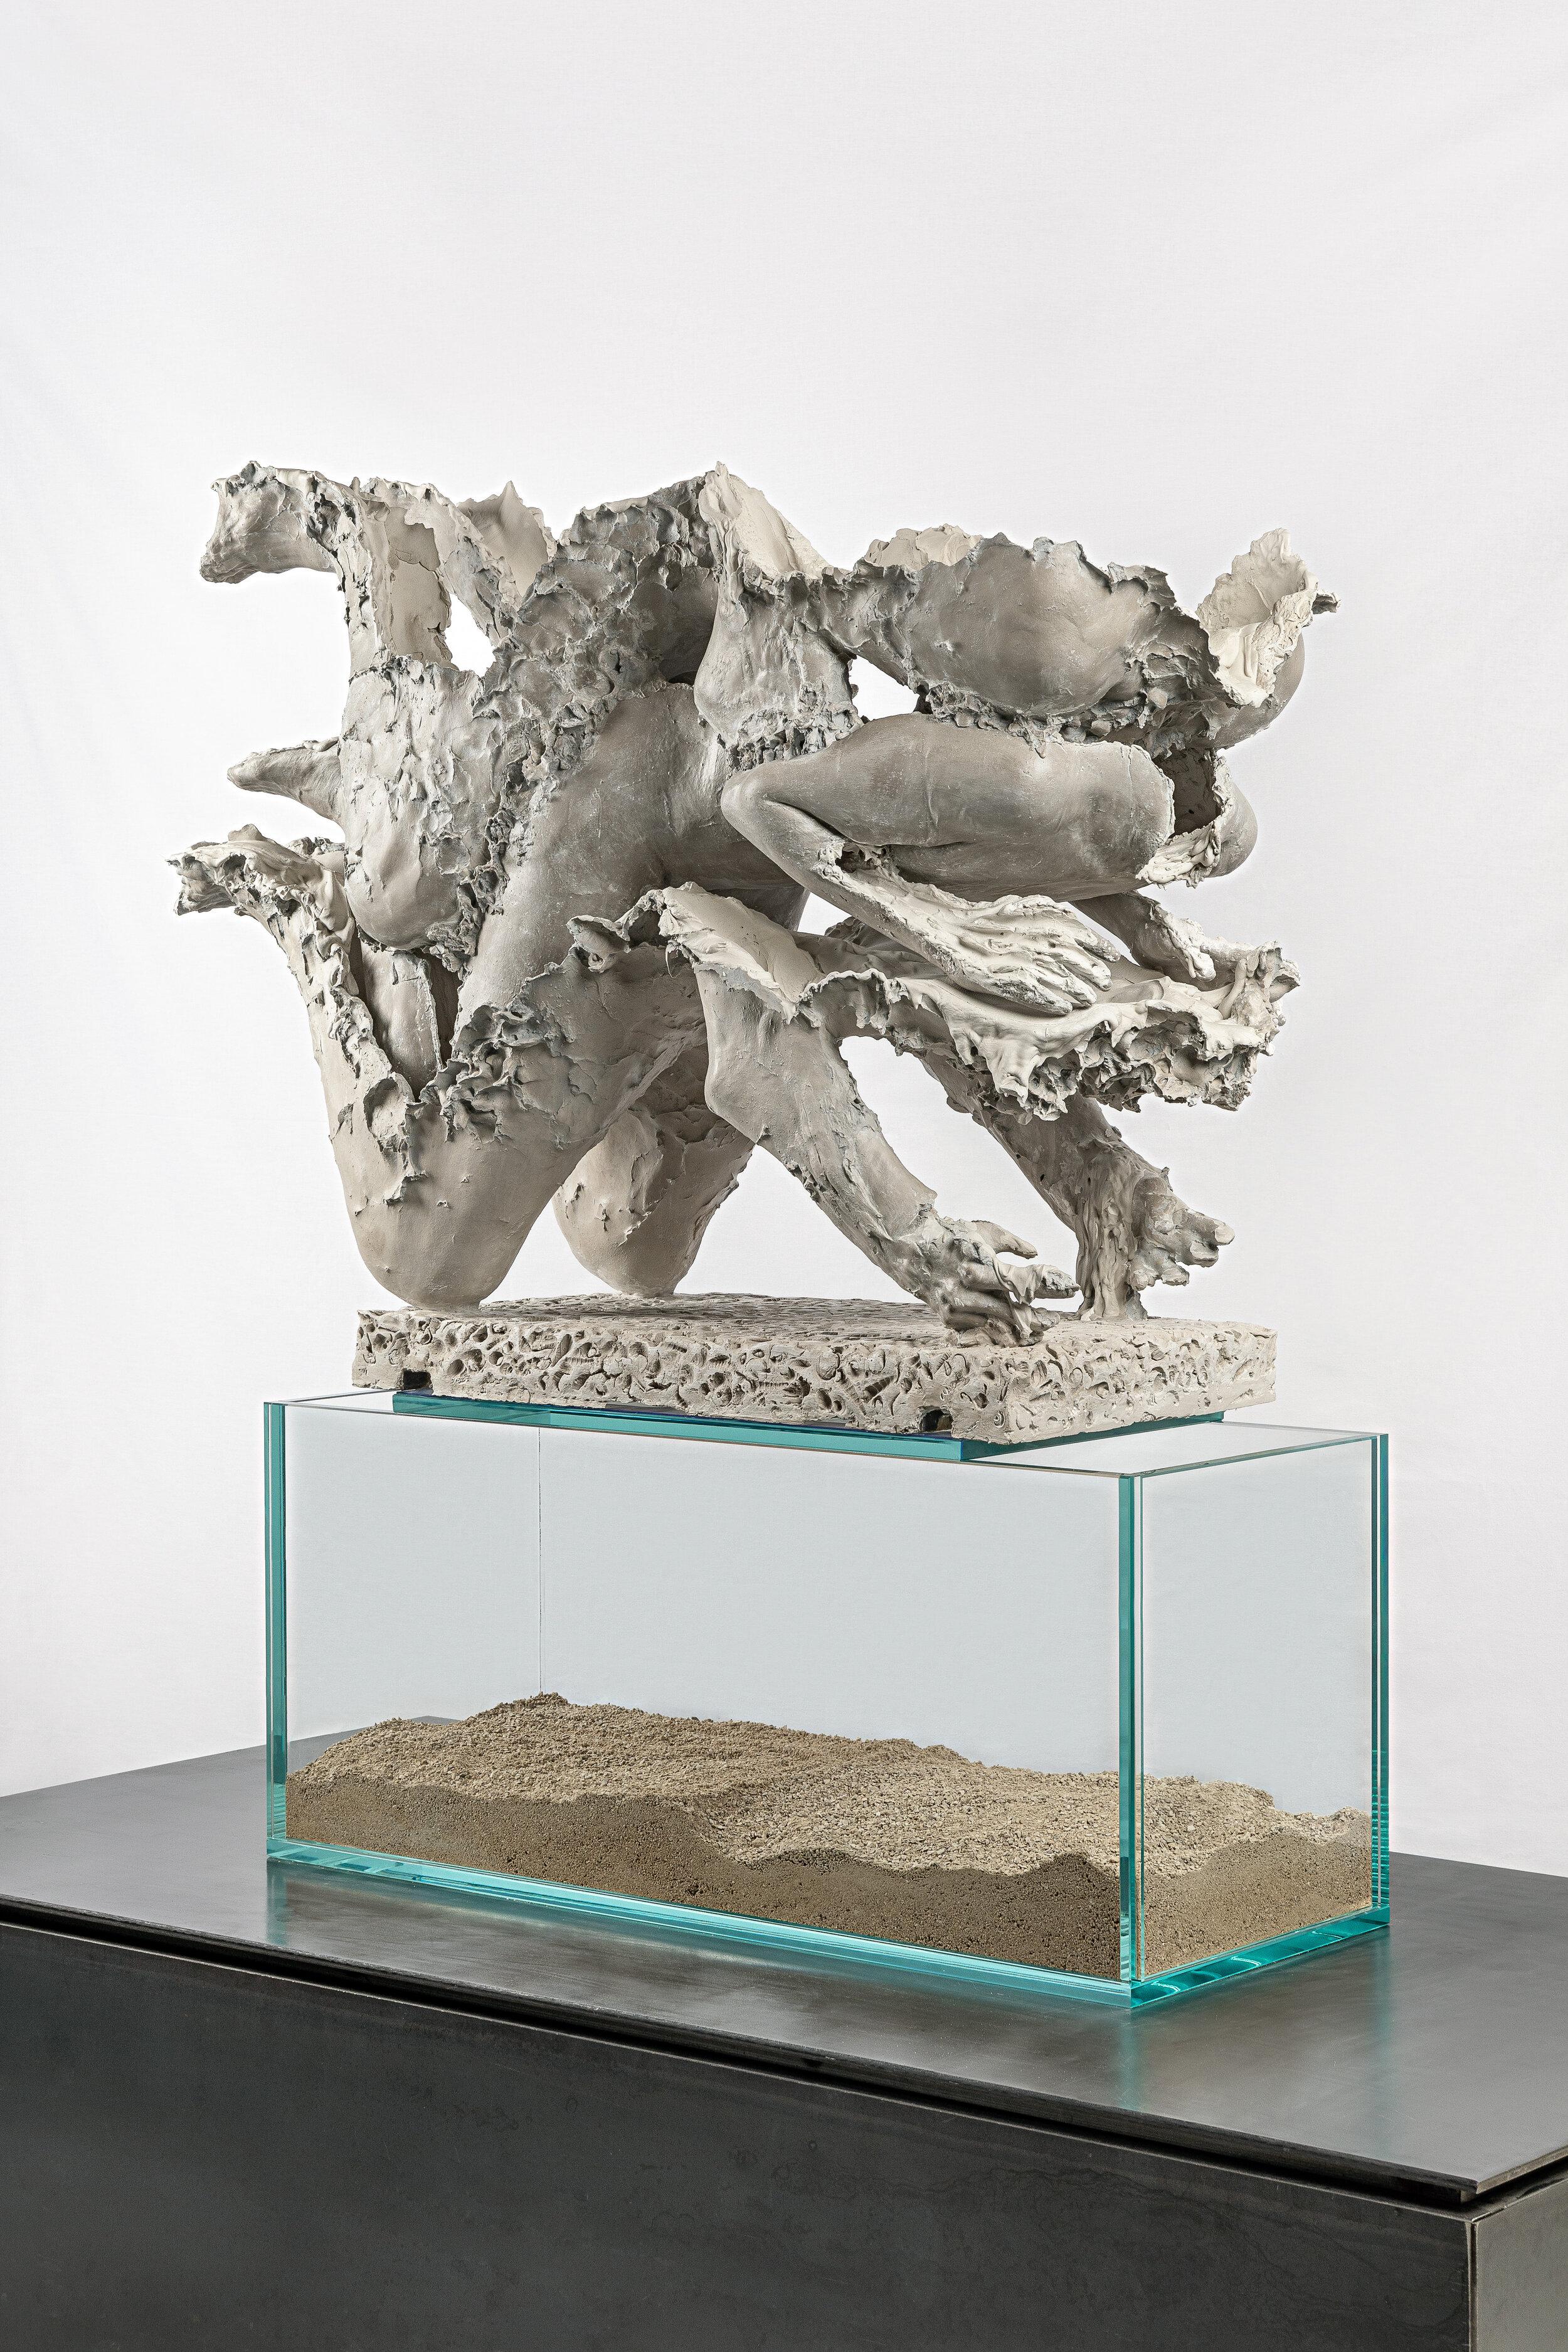 Calcify   Aquaresin, hydrocal, steel, glass, limestone sand, glass fiber, pigment, clay    140 x 45 x 100 cm    2019